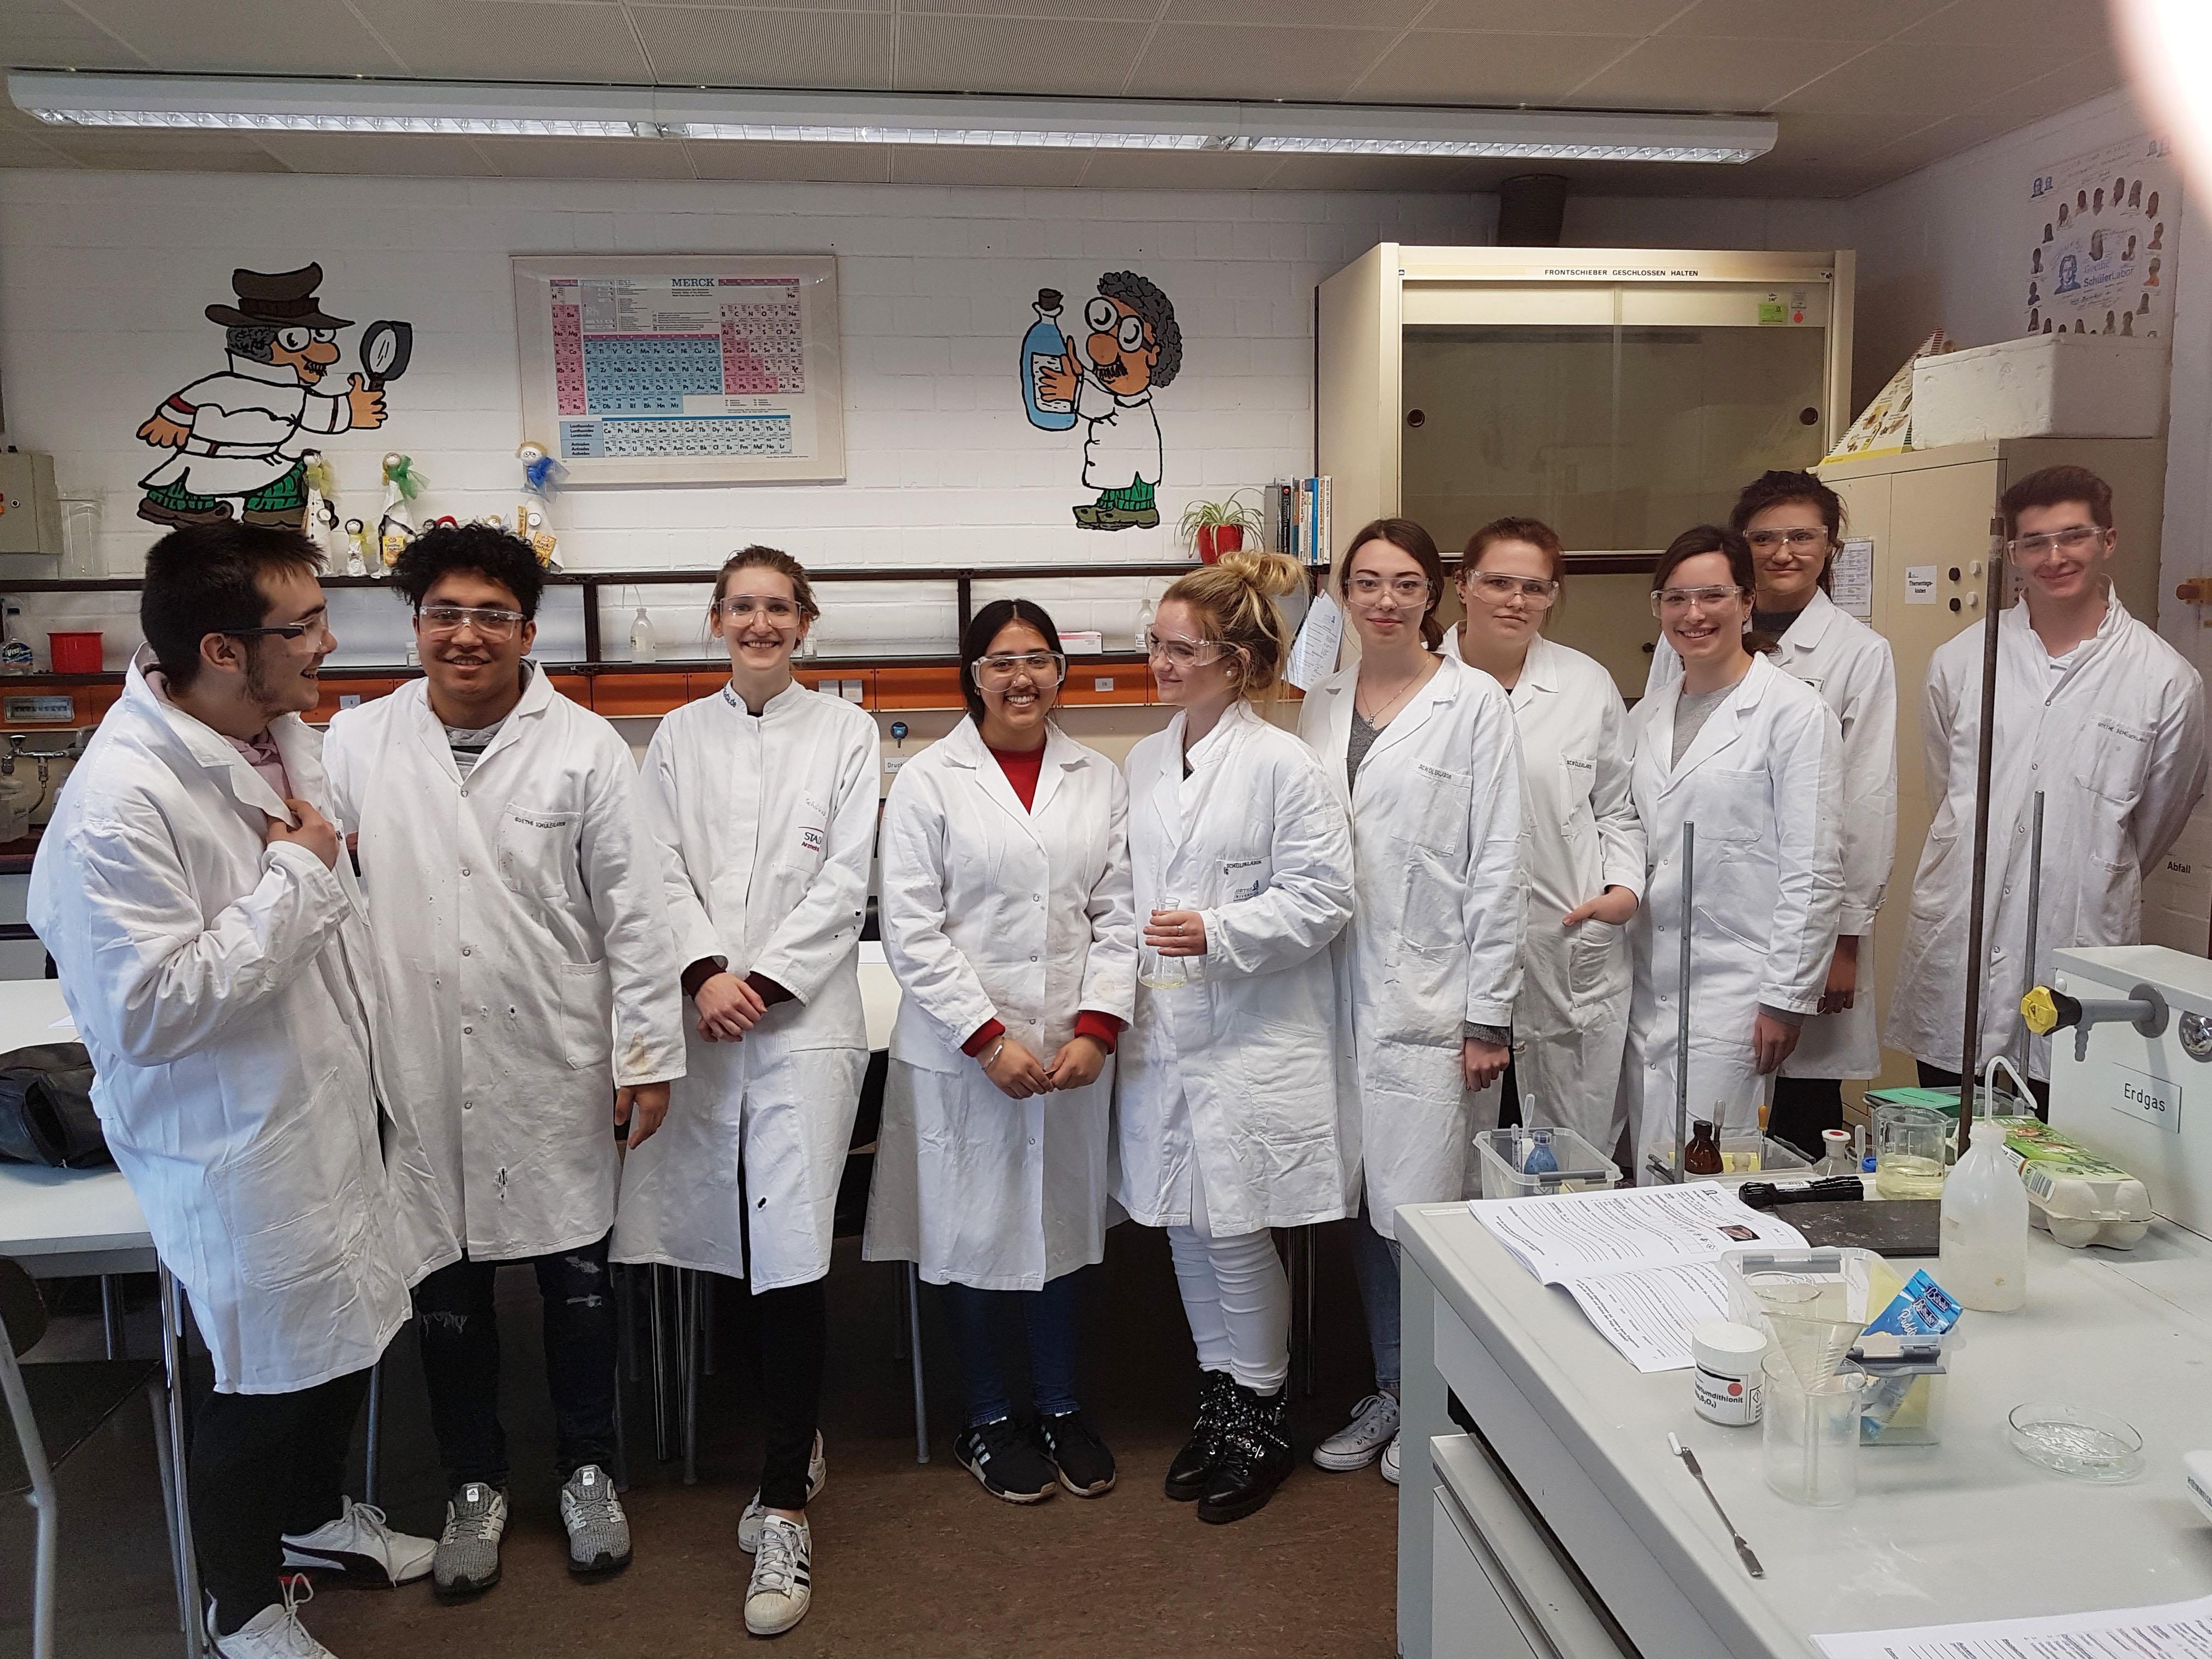 Universität Chemie